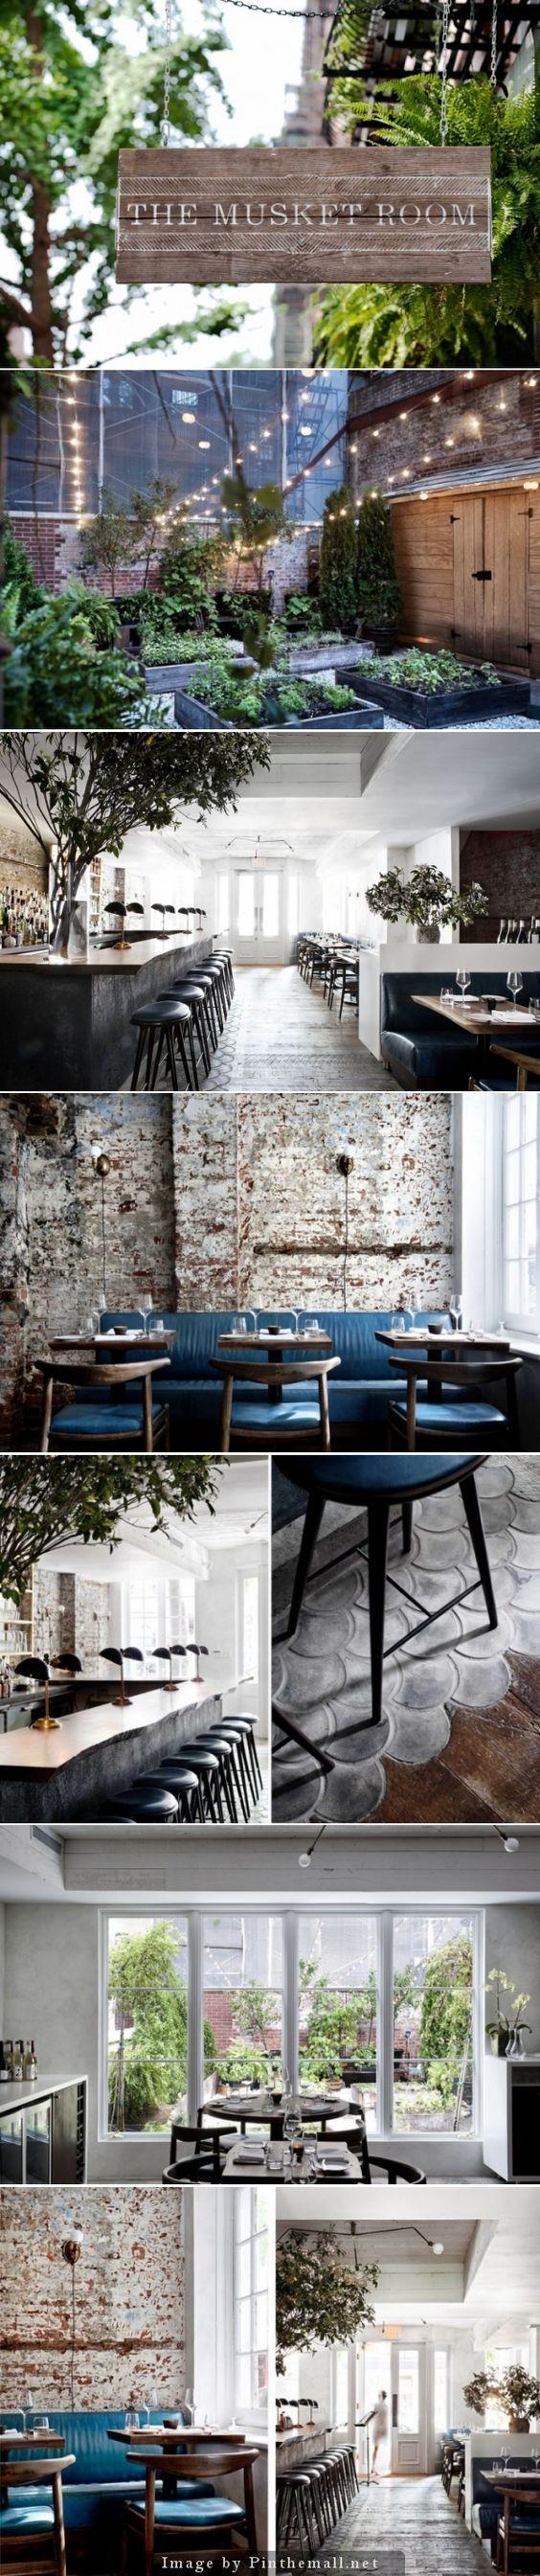 79 best restaurant images on pinterest charred wood container interior design ideas restaurant bar vintage style parisarafo Images